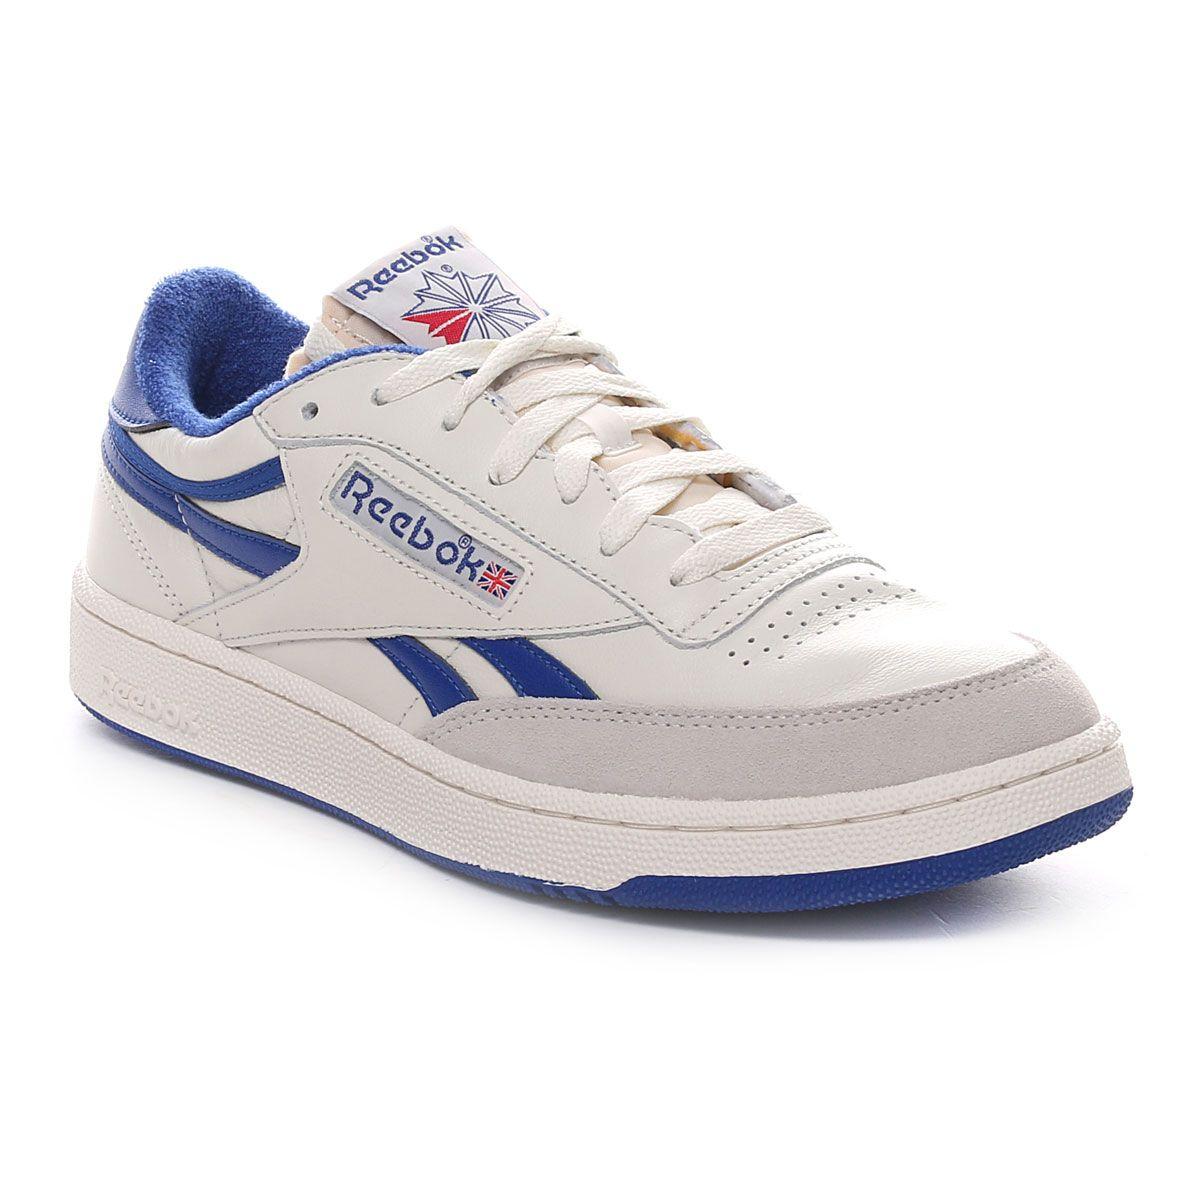 Reebok Club C Revenge Vintage Uomo Bianco Blu